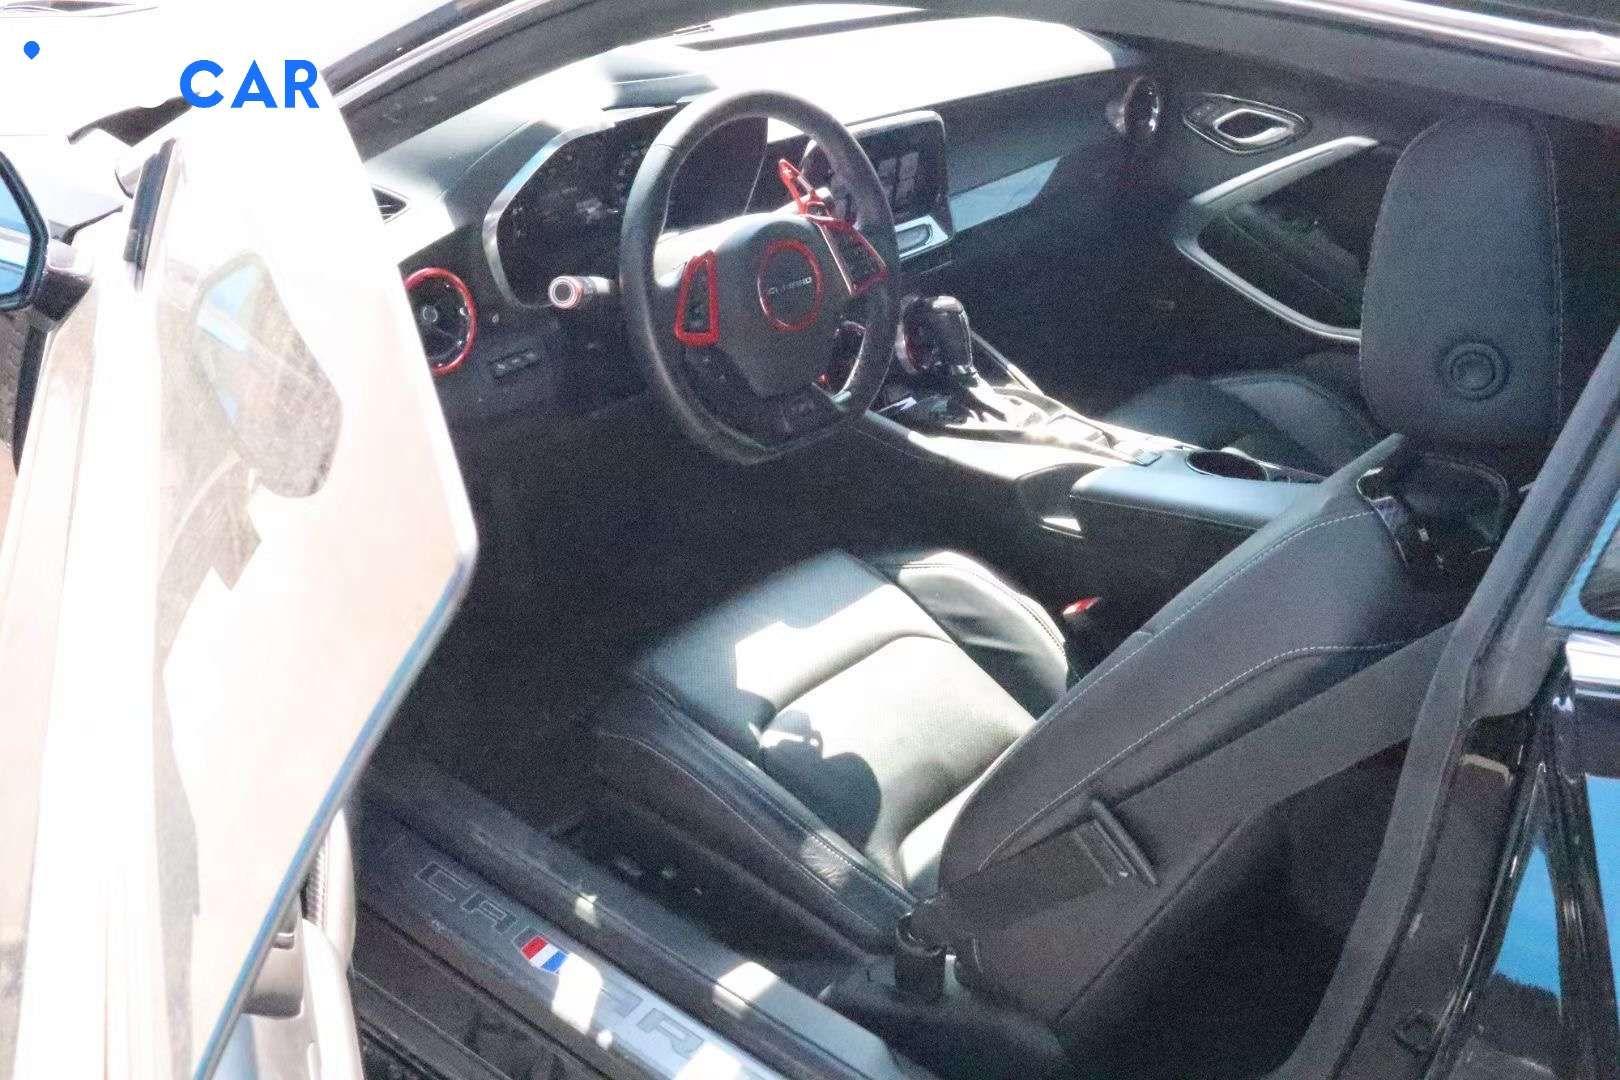 2018 Chevrolet Camaro null - INFOCAR - Toronto Auto Trading Platform